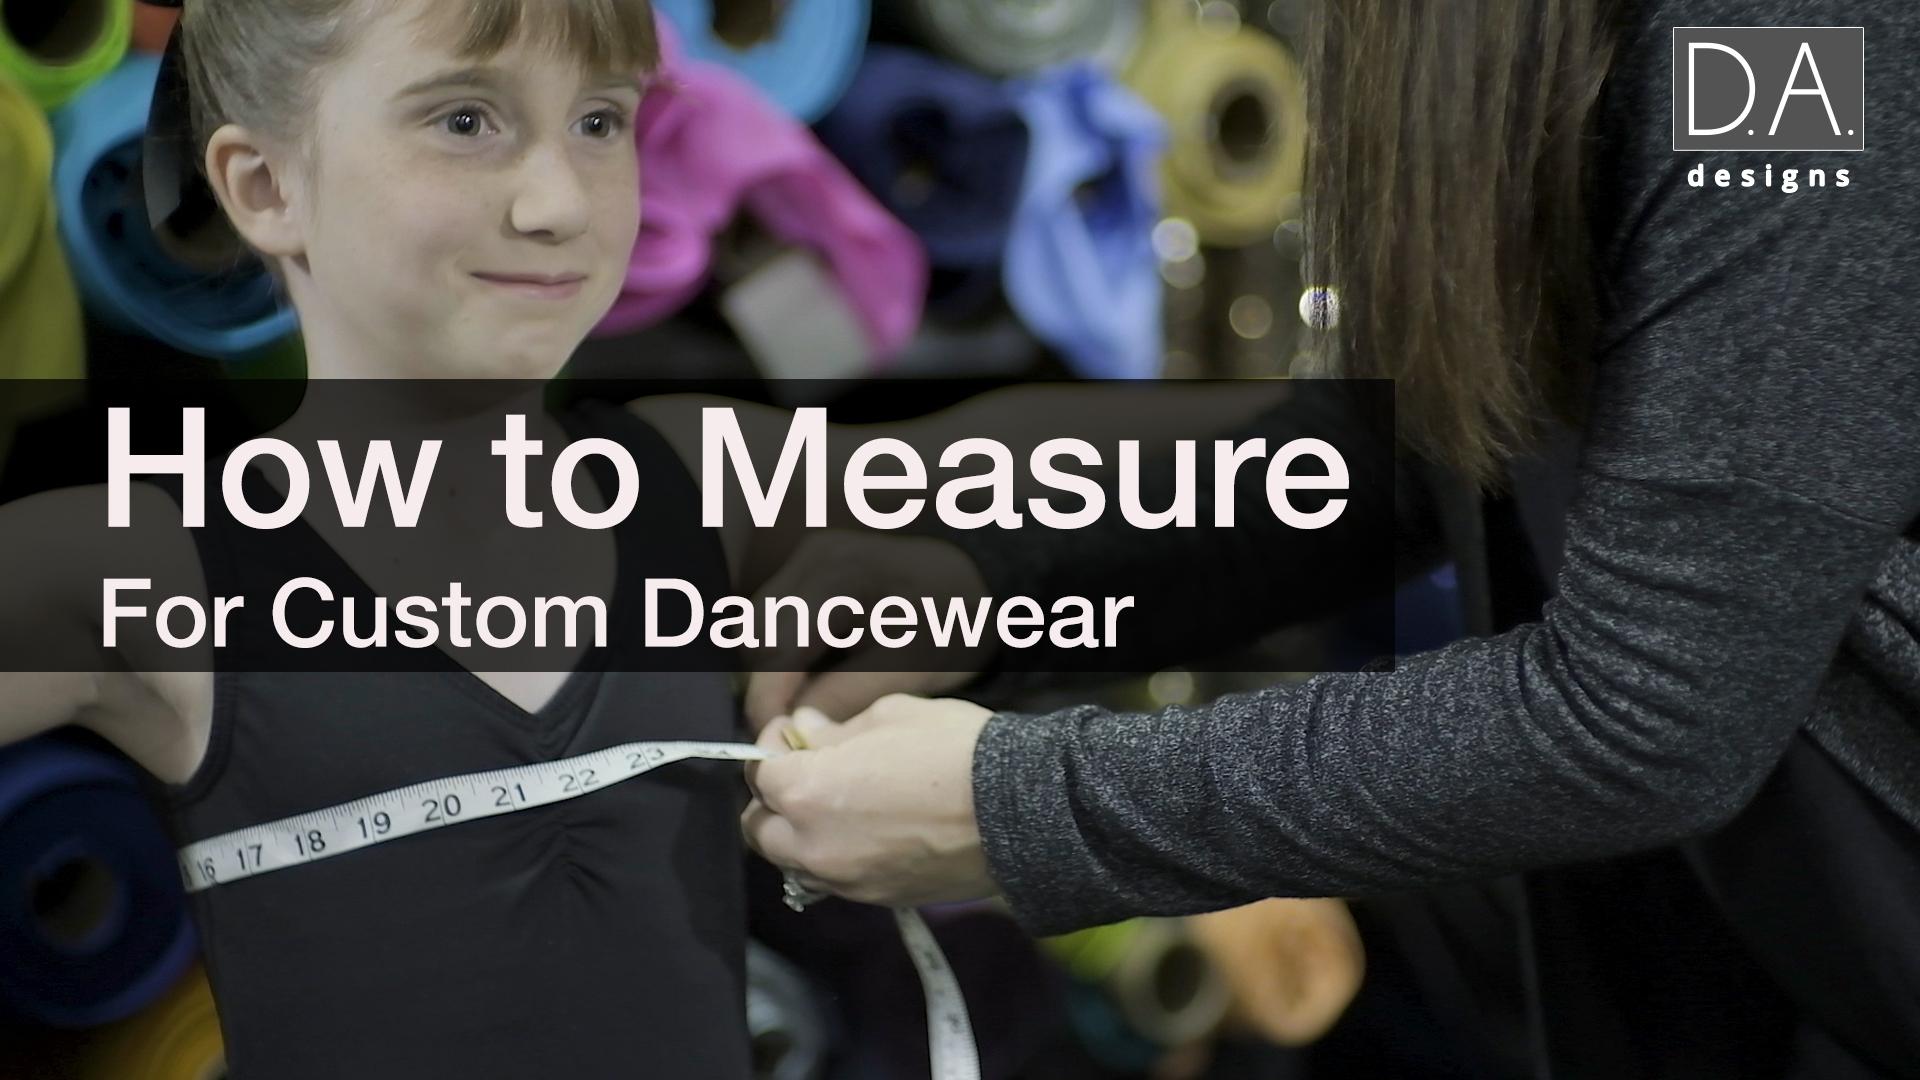 How To Measure For Custom Dancewear